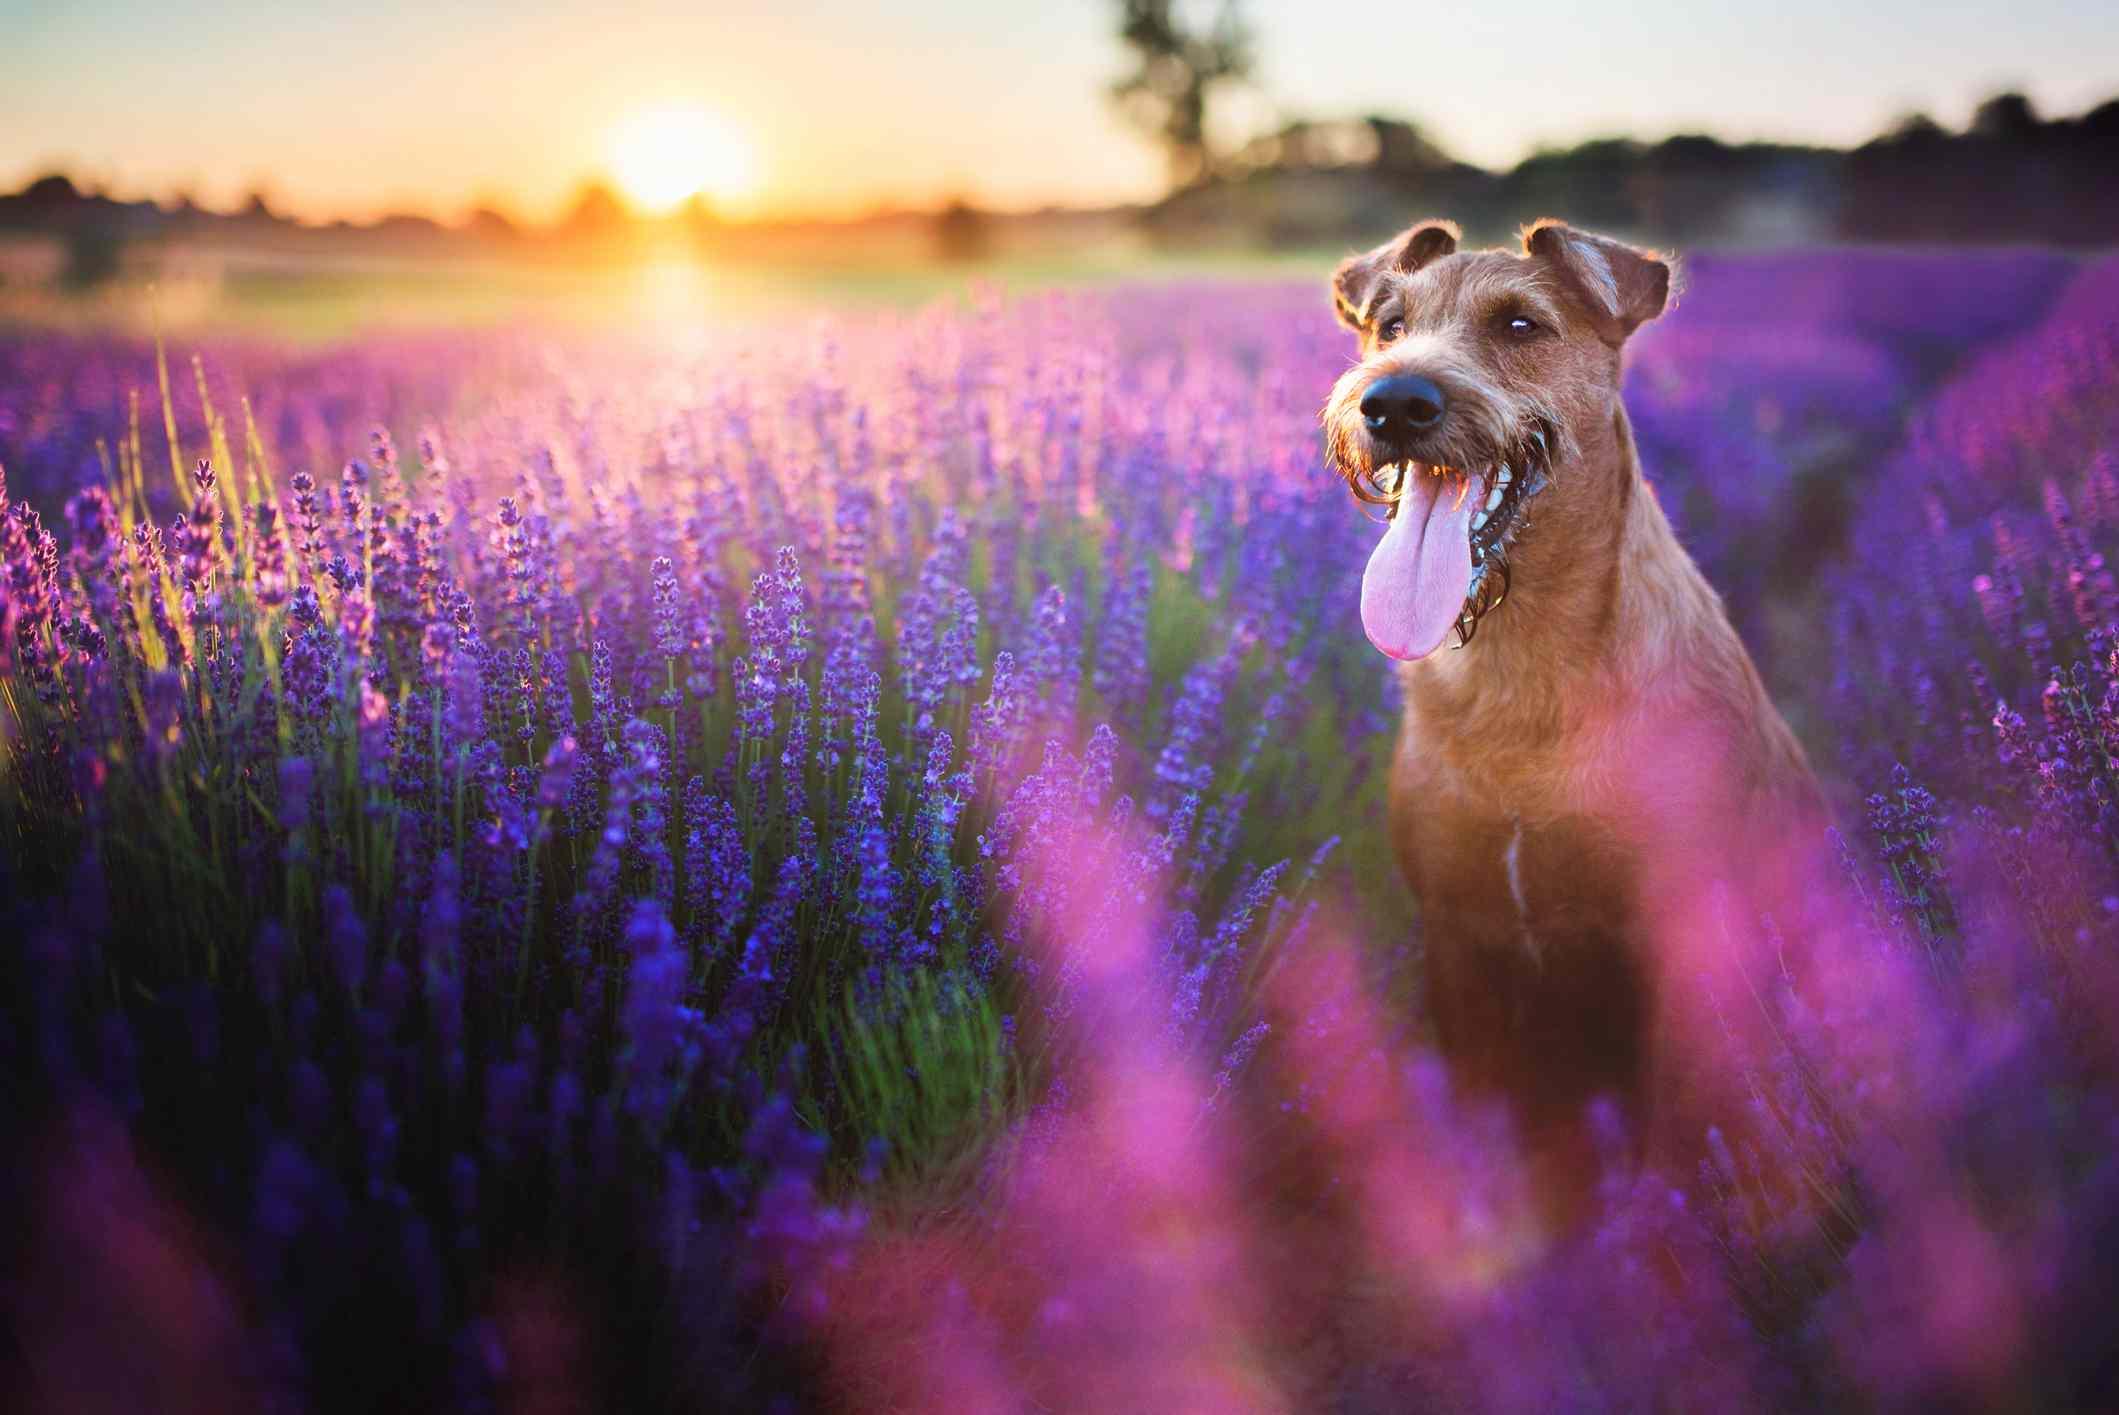 Brown dog sitting in field of purple flowers